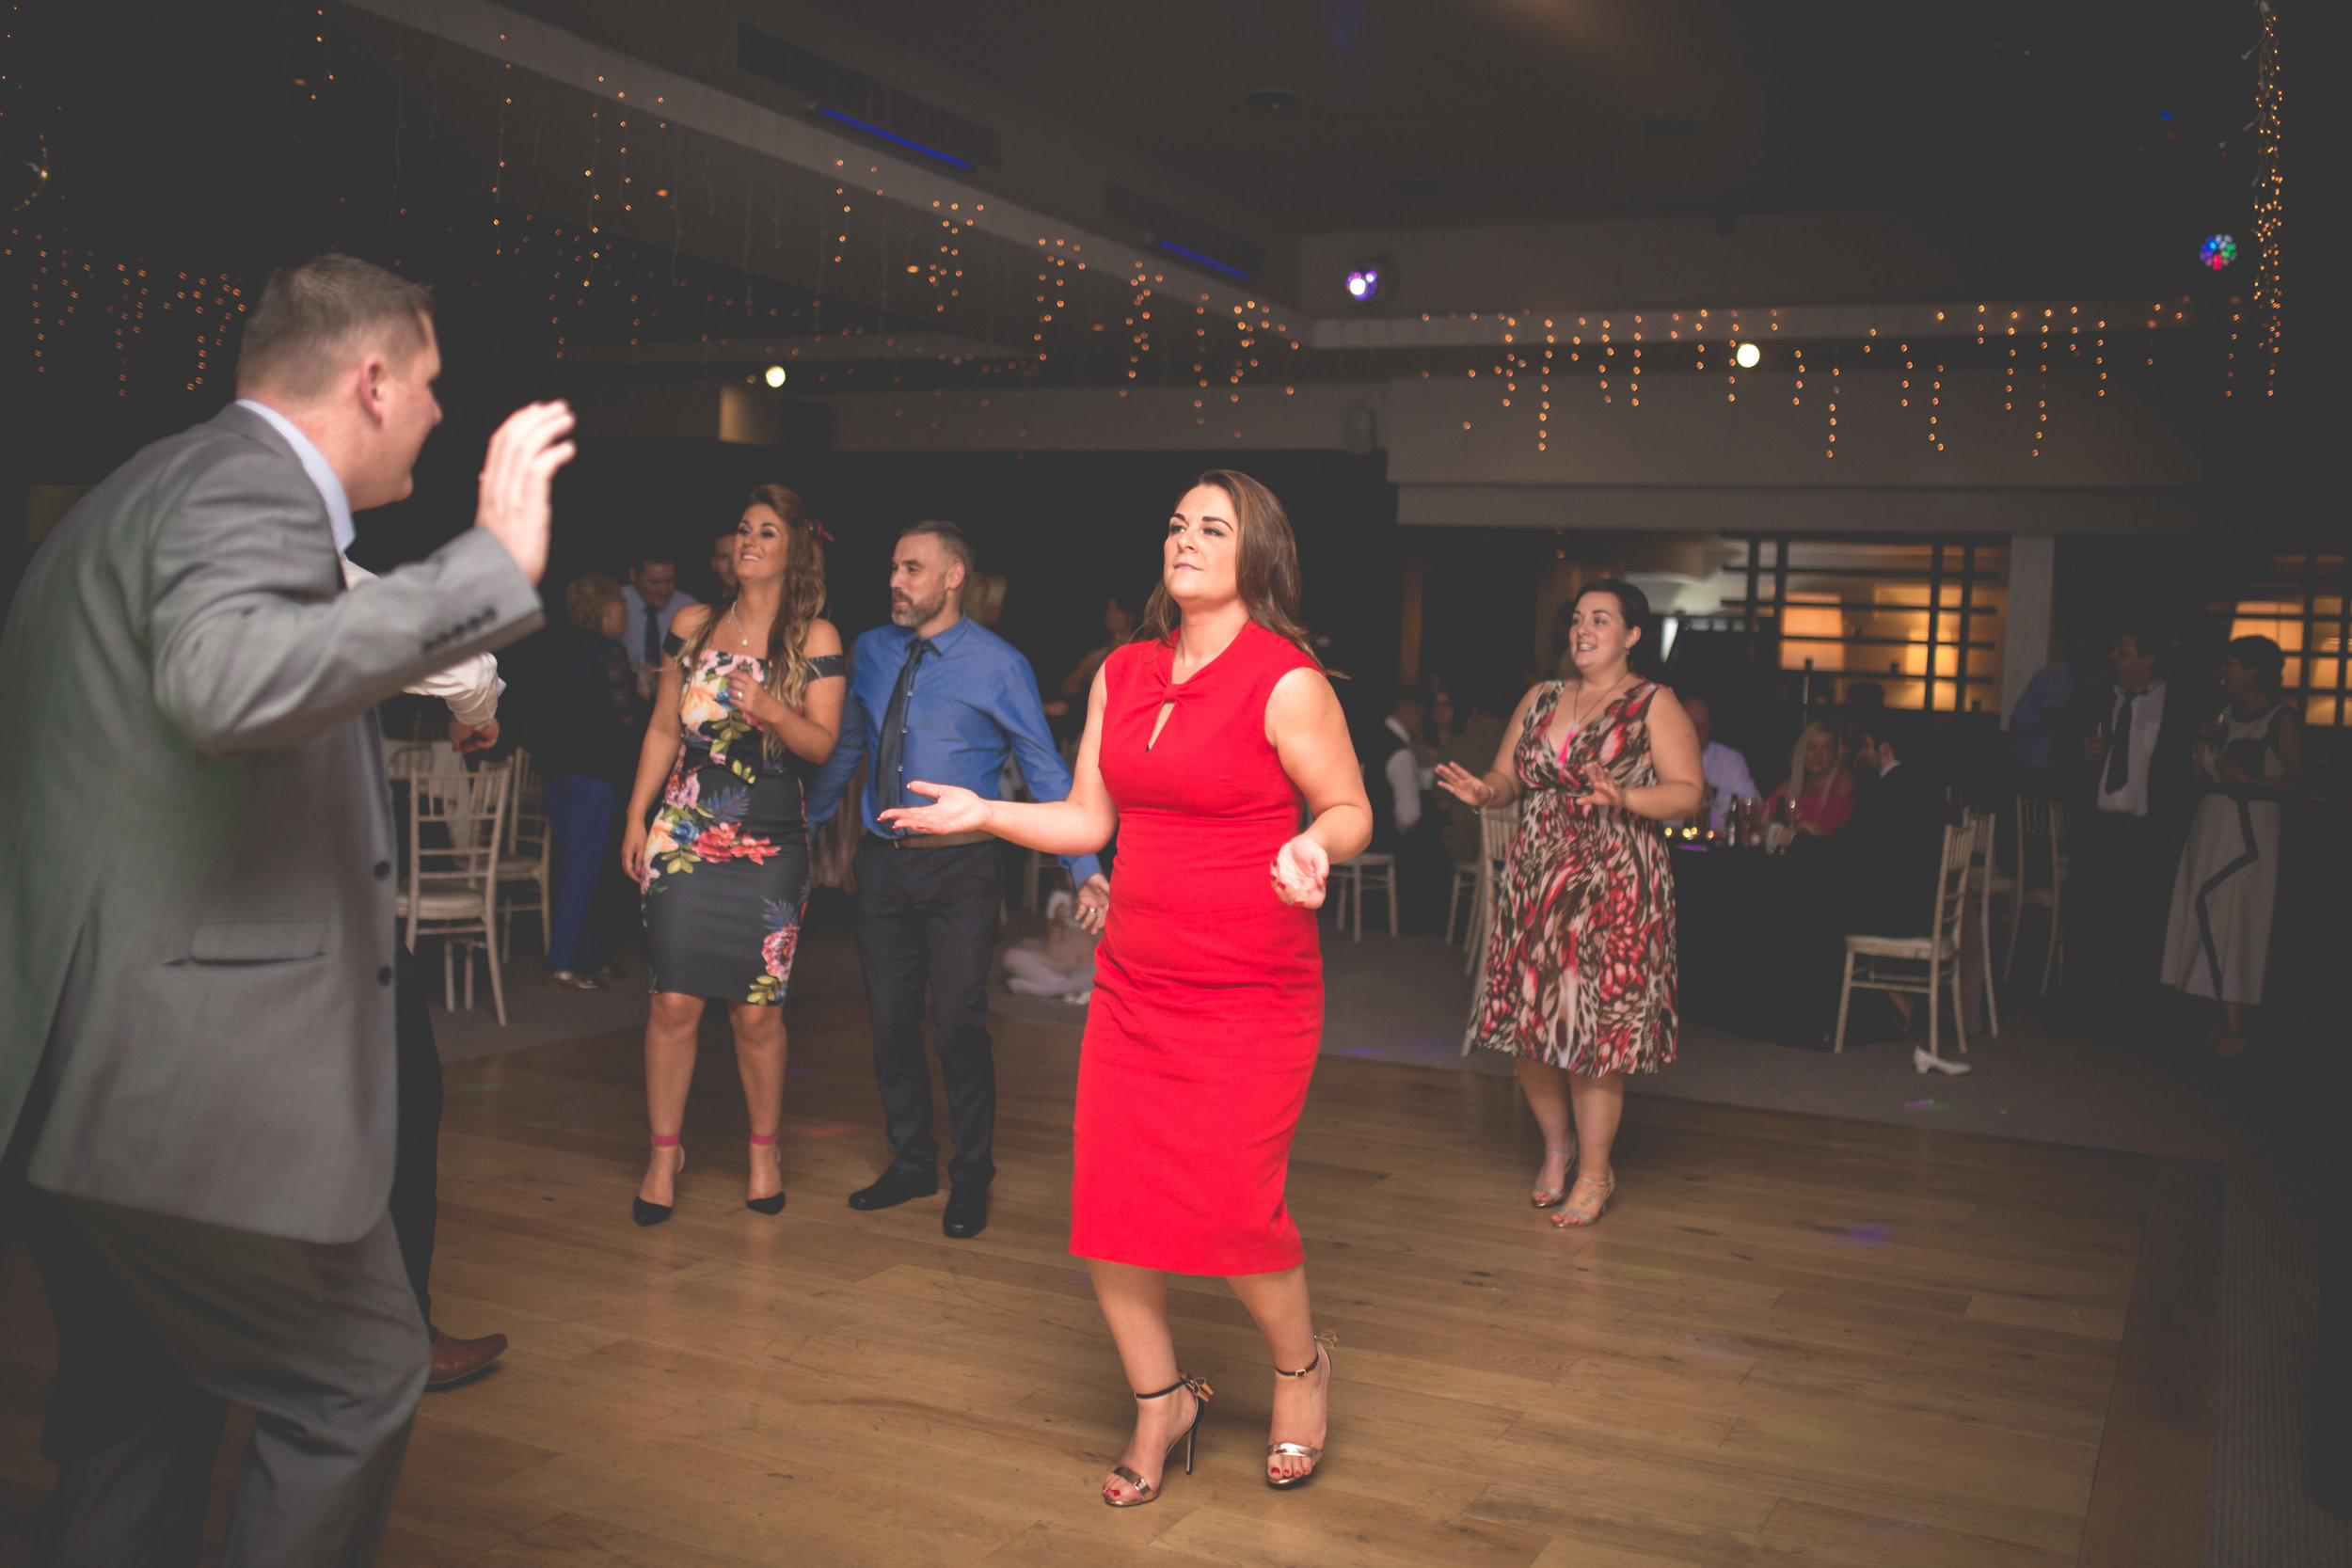 Helena & Terence - First Dance-44.jpg